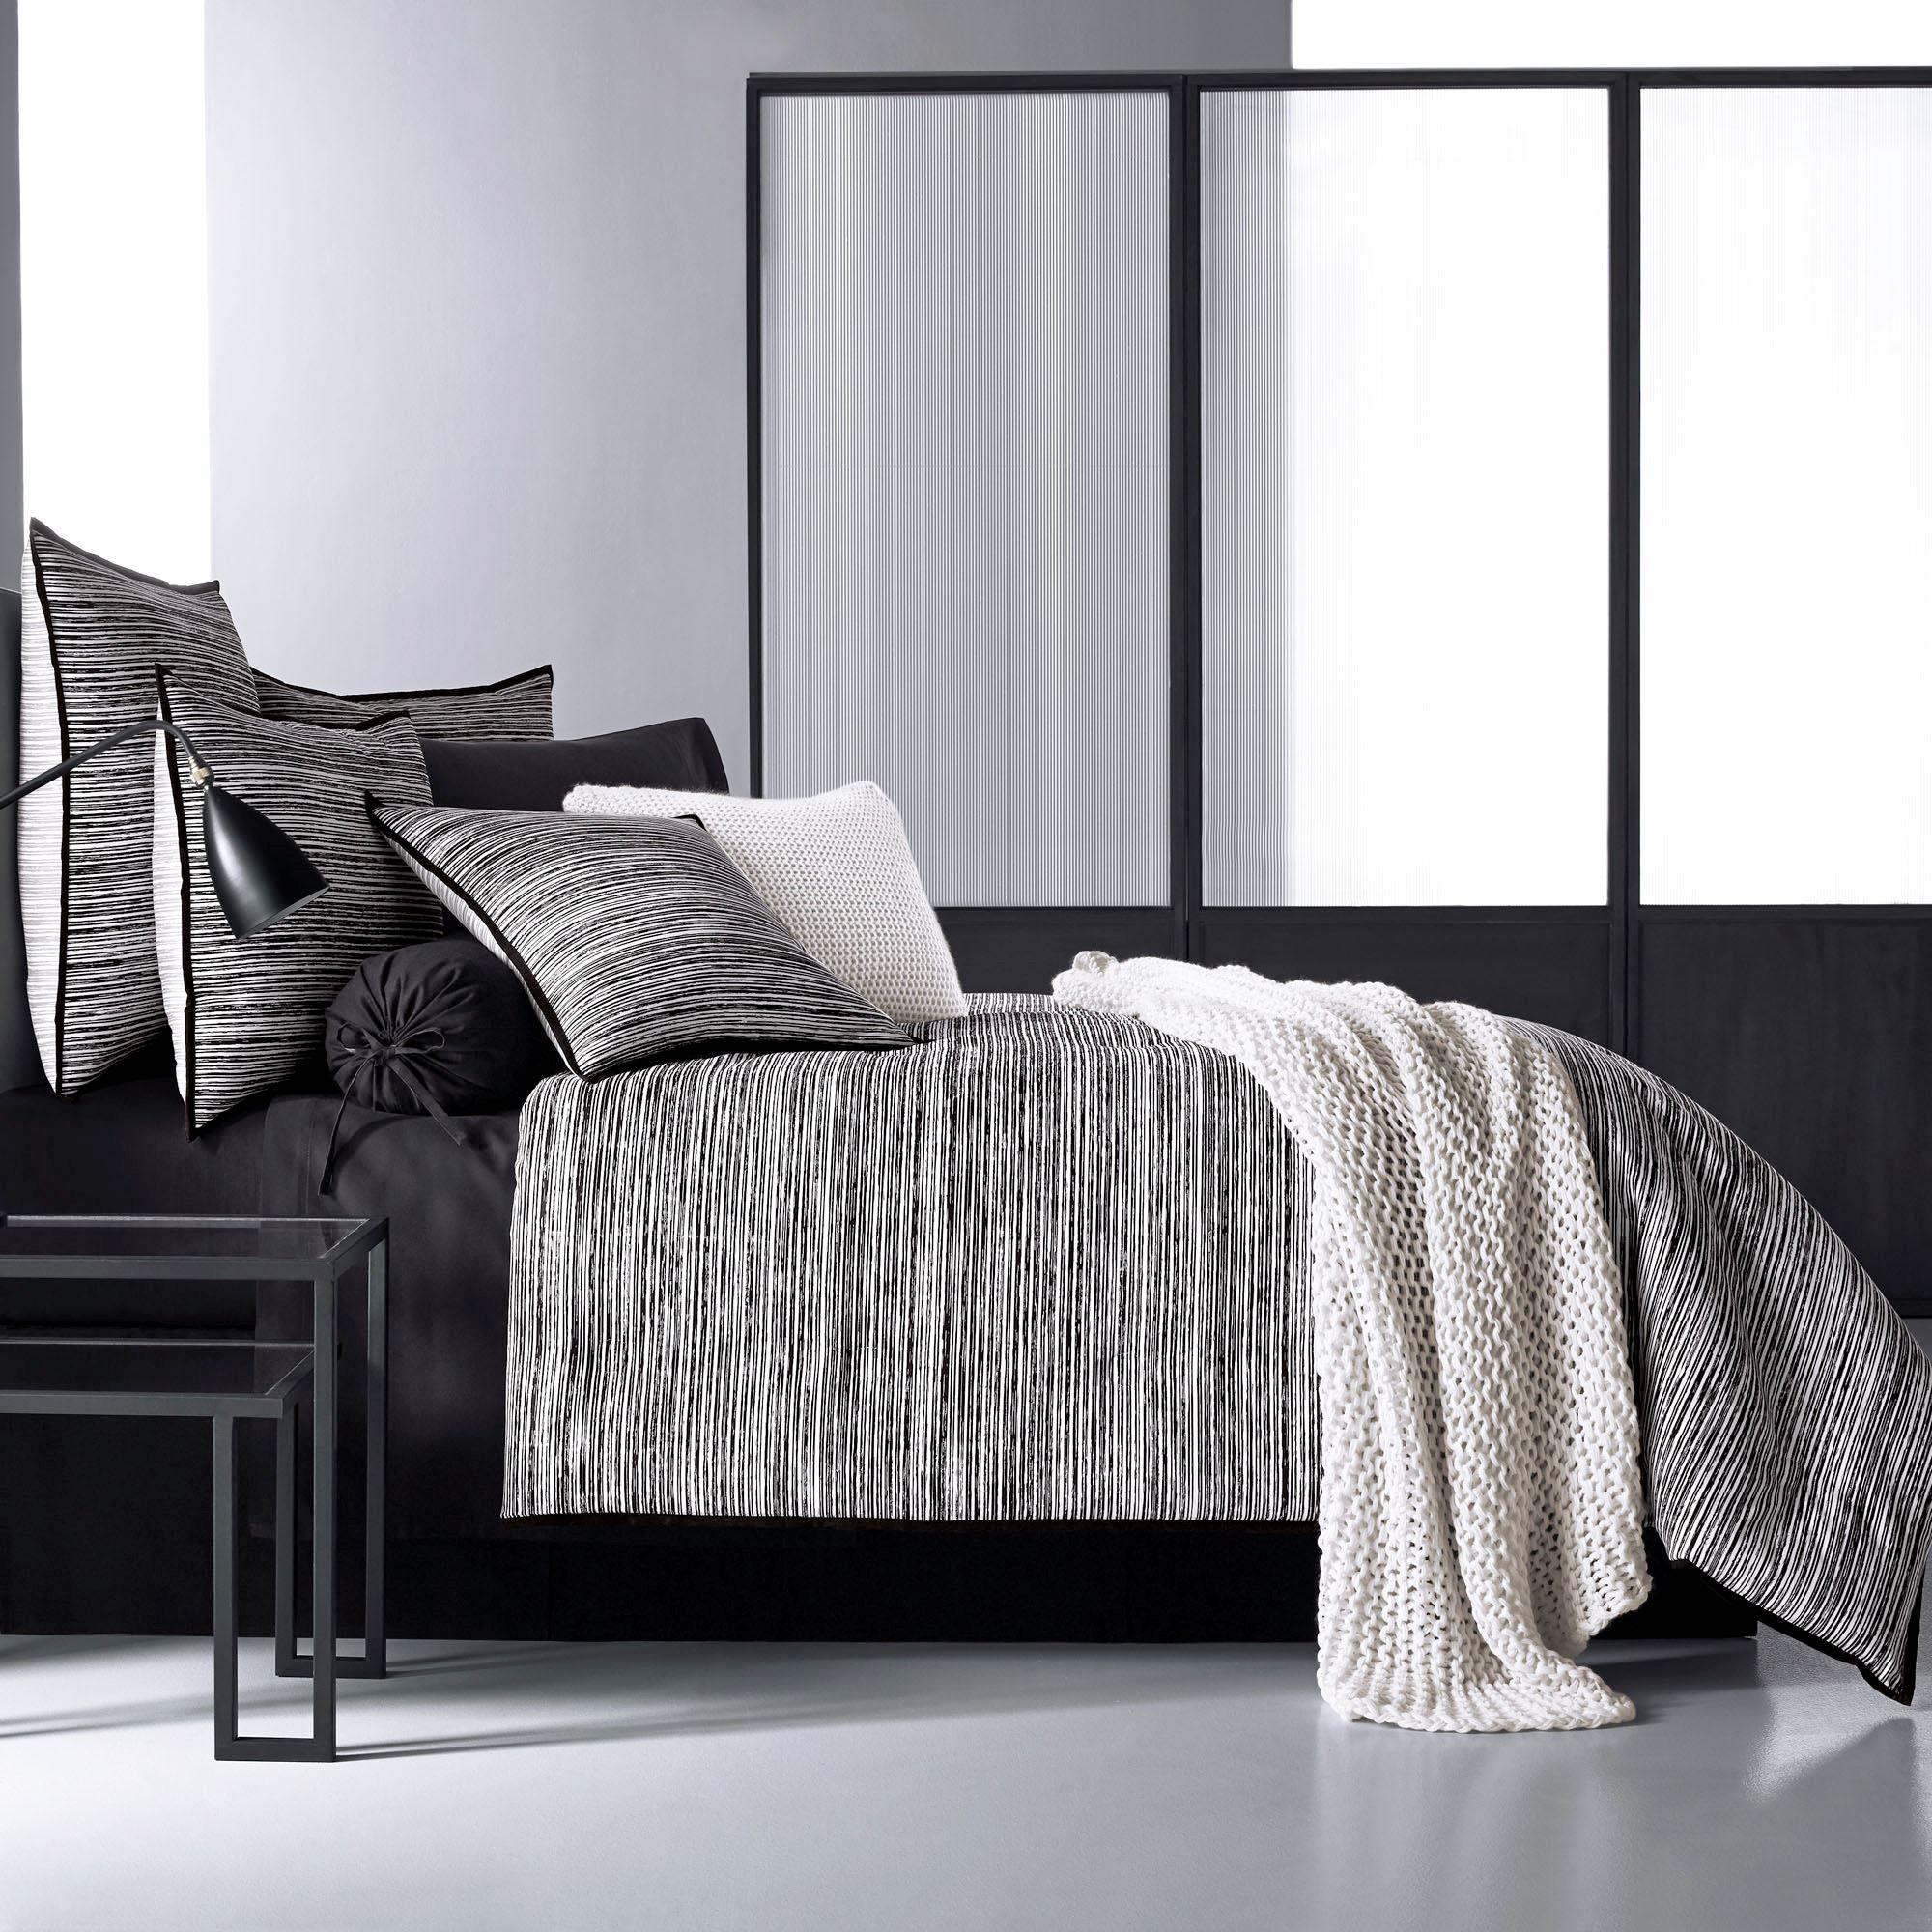 flen black and white striped comforter bedding by oscar oliver new york city